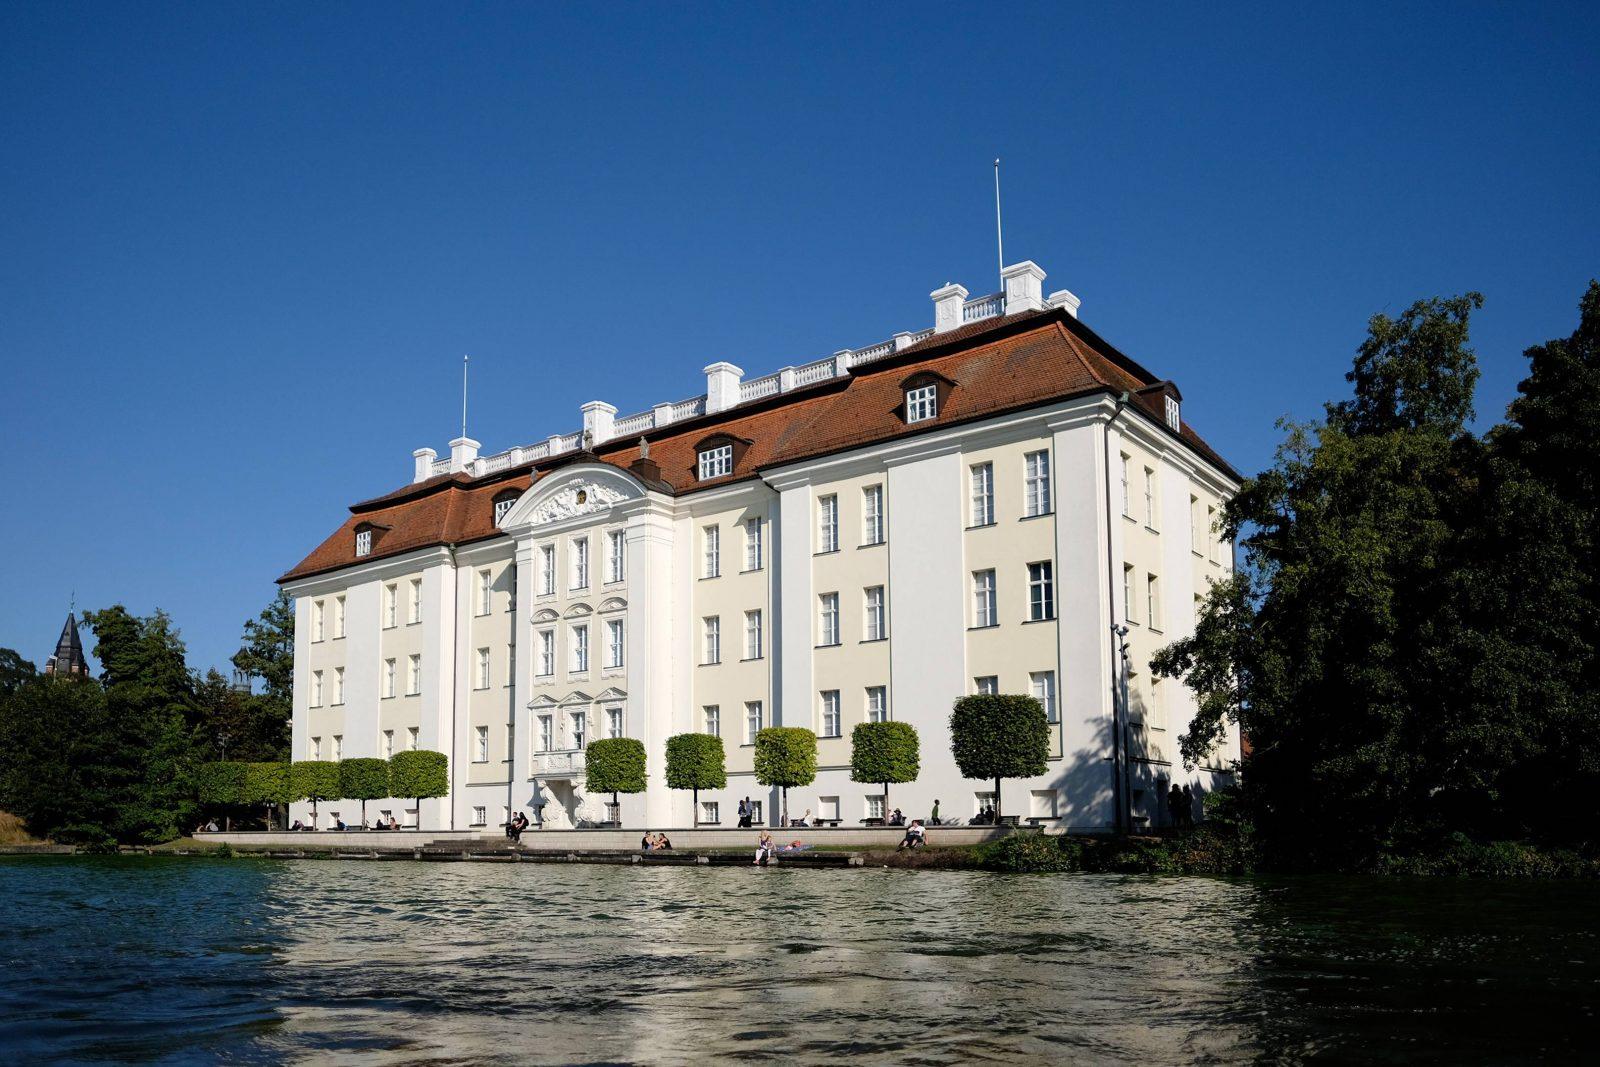 12 tolle Orte in Köpenick: Schloss Köpenick.  Foto: Imago/Snapshot